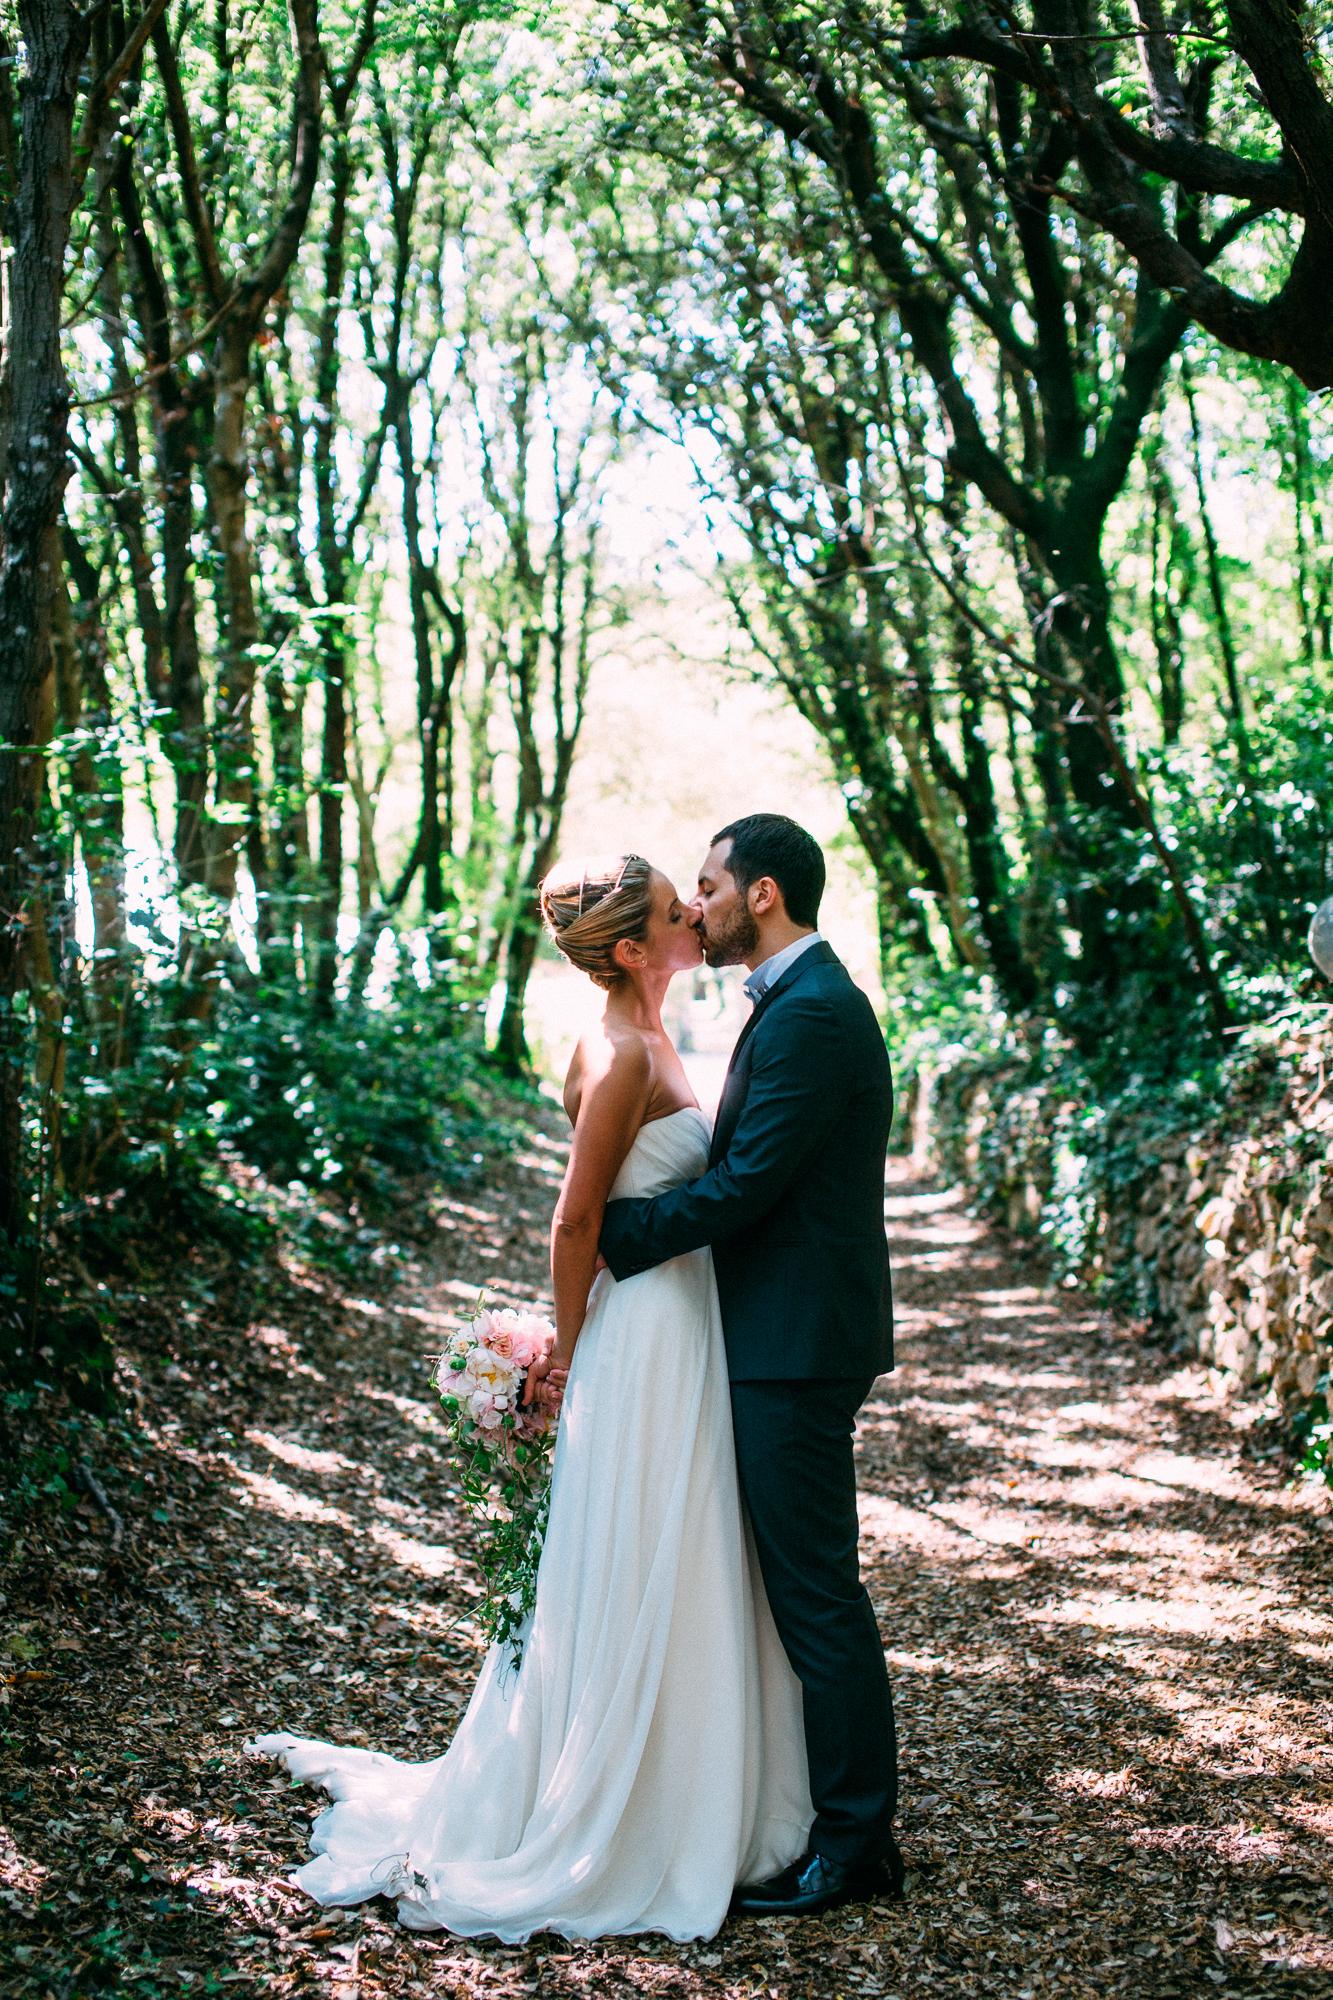 185-bride groom wedding portrait photographer marche conero.jpg